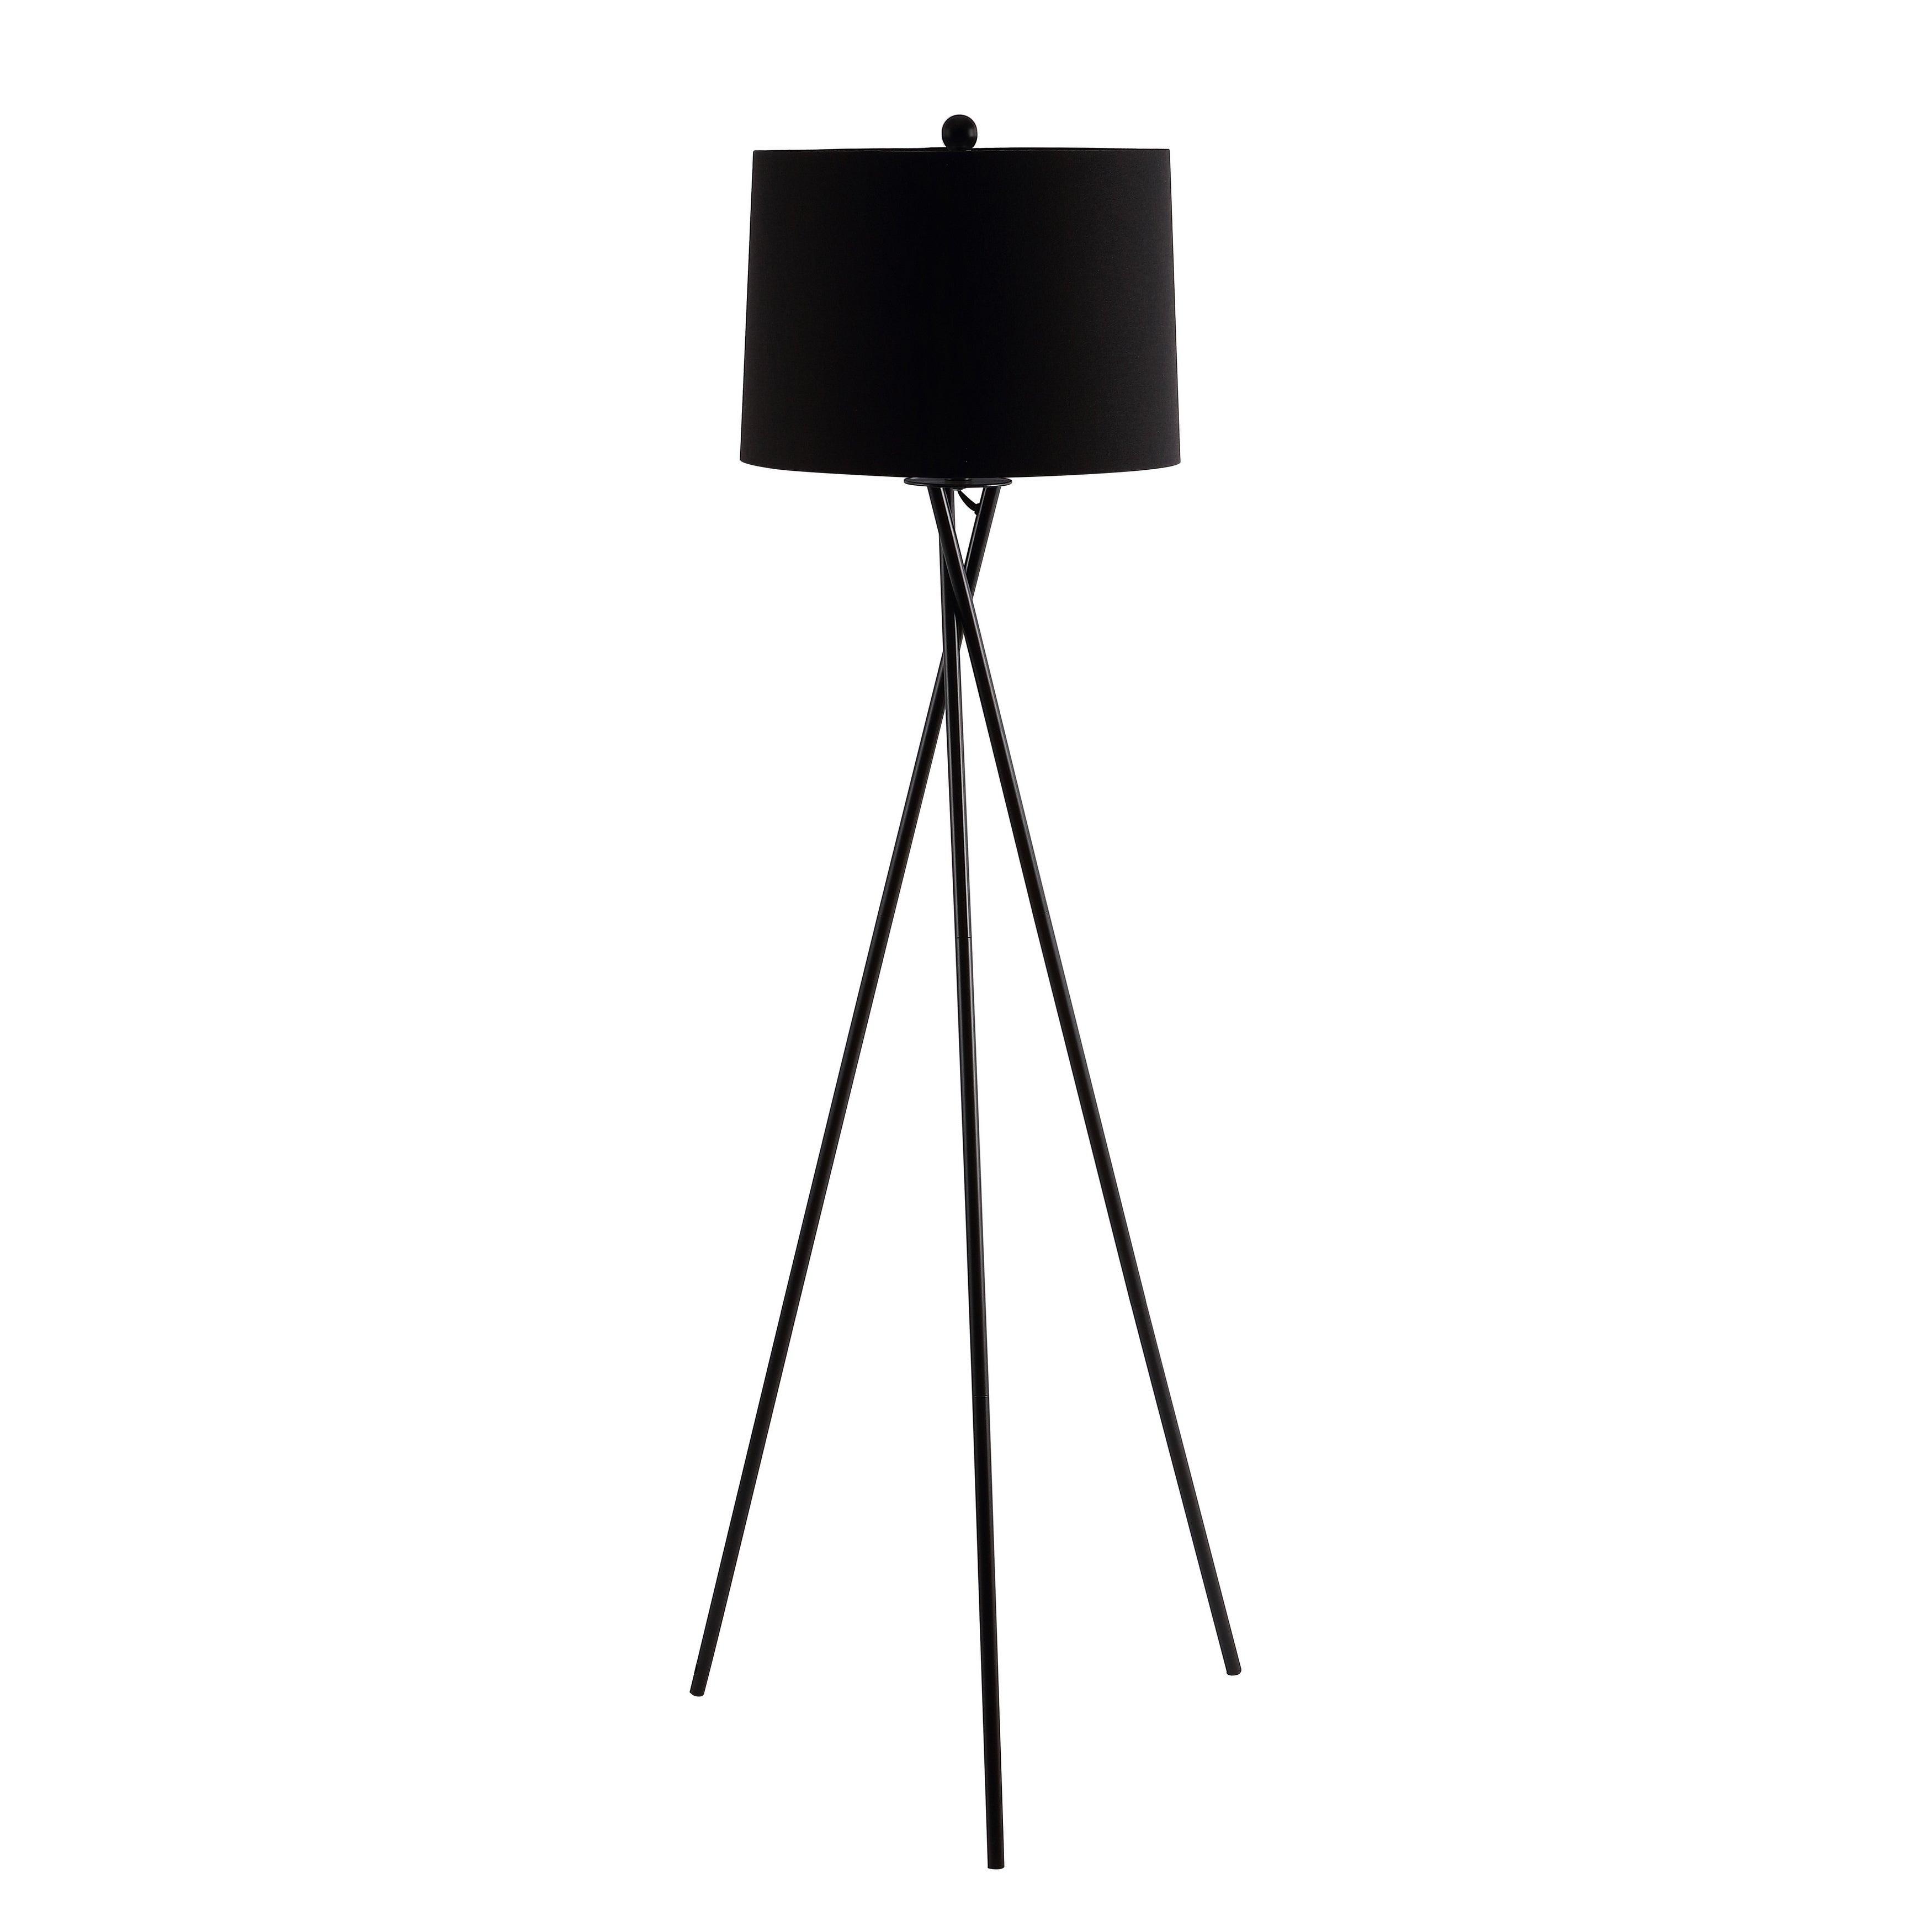 Safavieh Lighting Parsen Tripod 62 Inch Led Floor Lamp 22 W X 22 L X 61 5 H Overstock 31634063